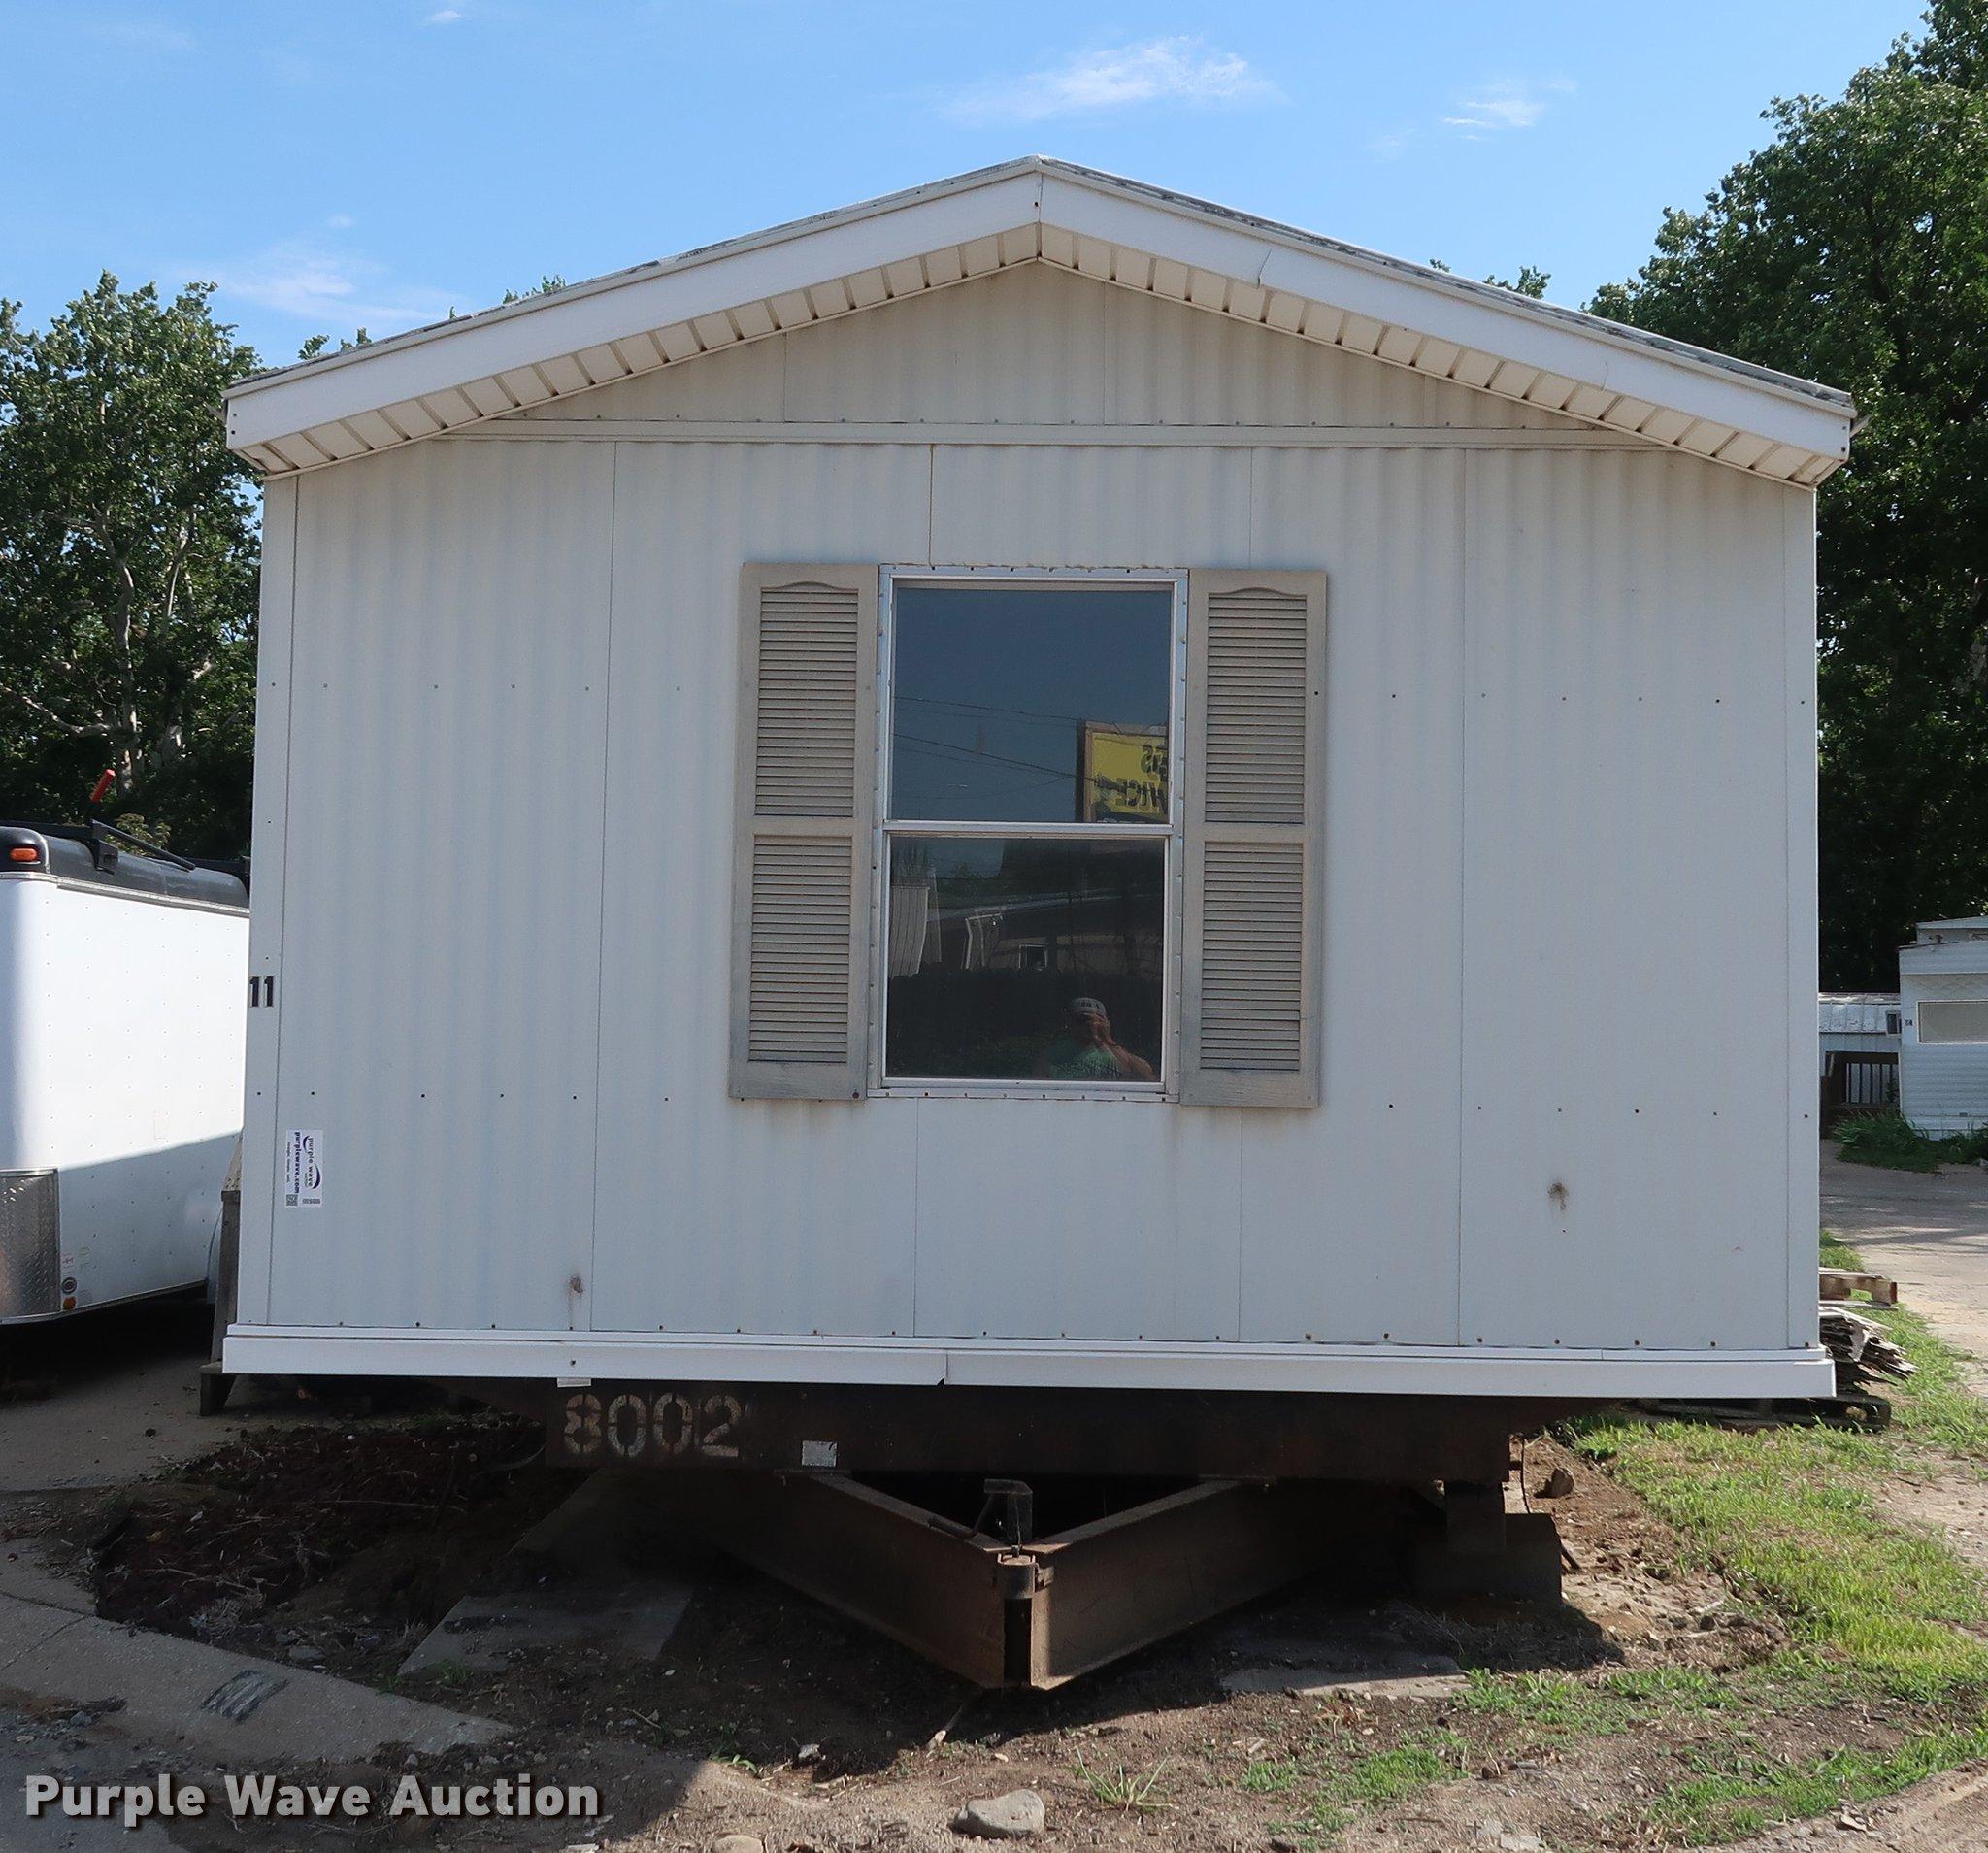 1995 Fleetwood Homes mobile home | Item DE6086 | SOLD! Augus